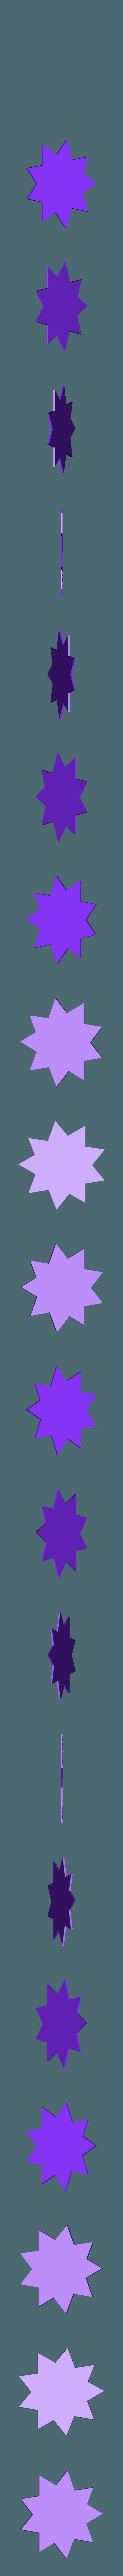 étoiles5.stl Download STL file snow stars • Model to 3D print, catf3d